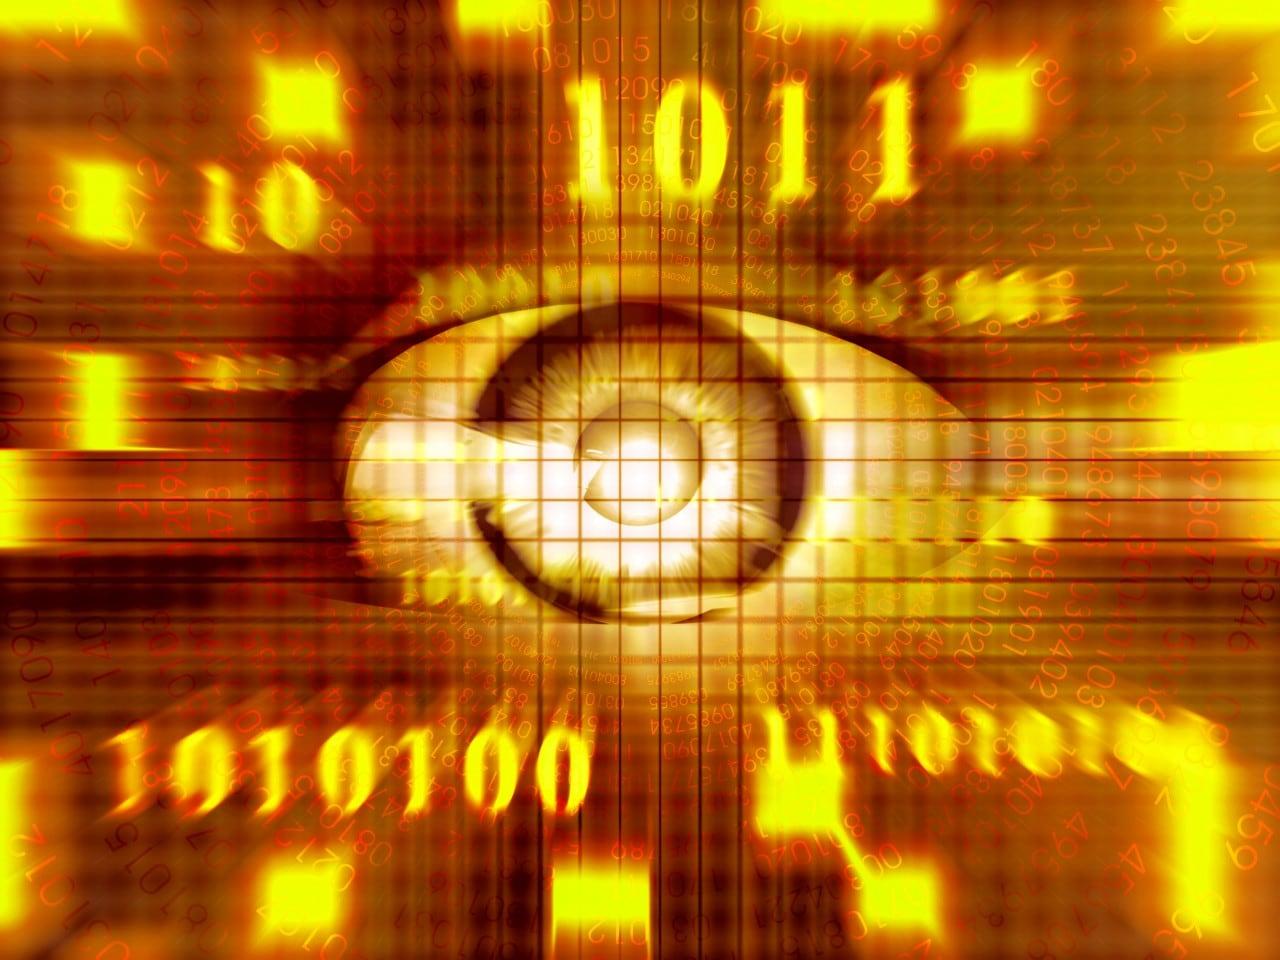 computer vision apical arm occhio